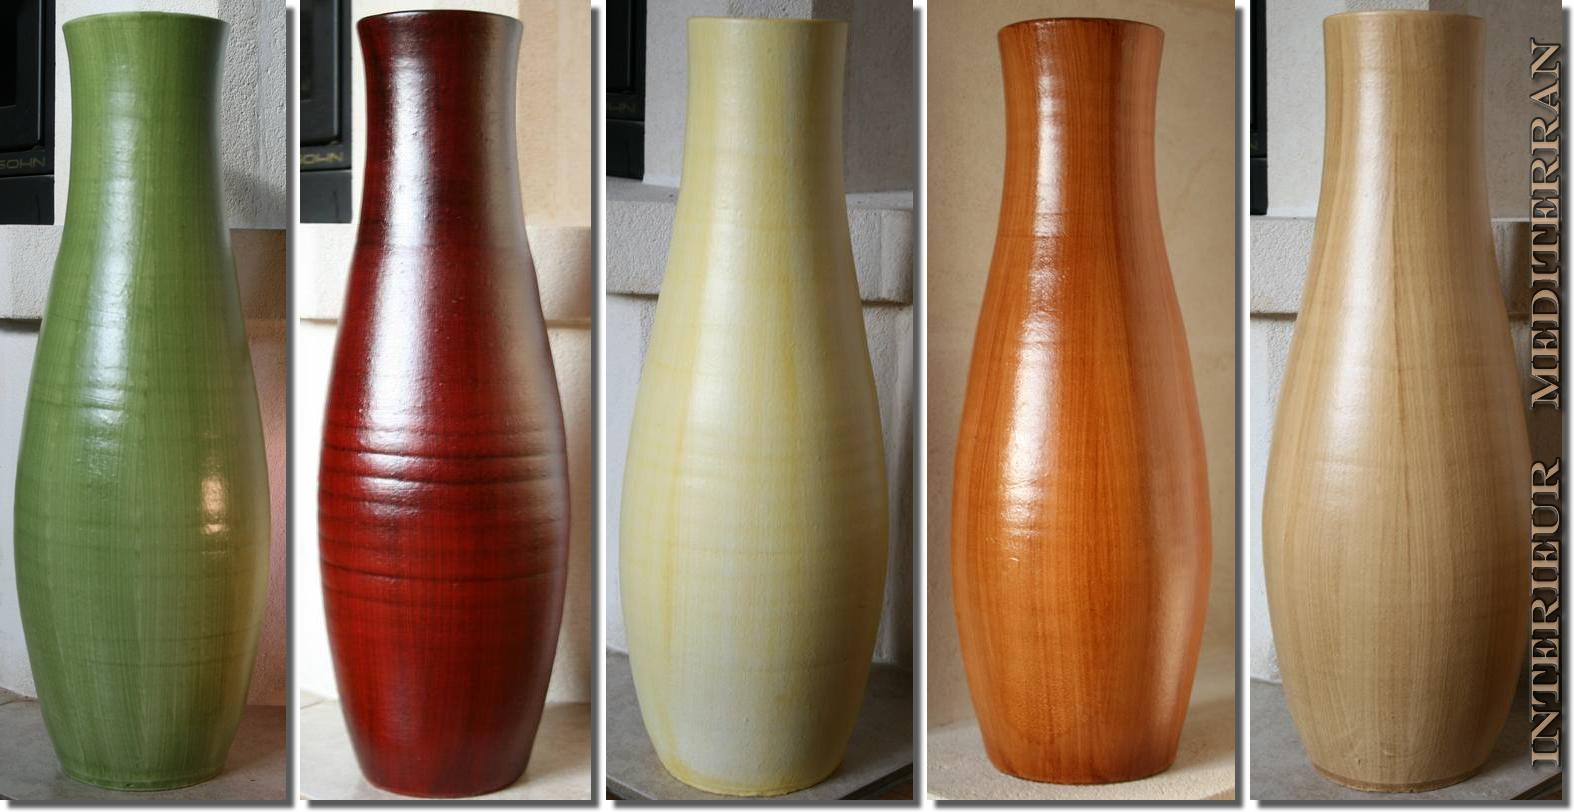 bodenvase vase keramik 50cm mediterran geschenkidee handarbeit portugal flur ebay. Black Bedroom Furniture Sets. Home Design Ideas